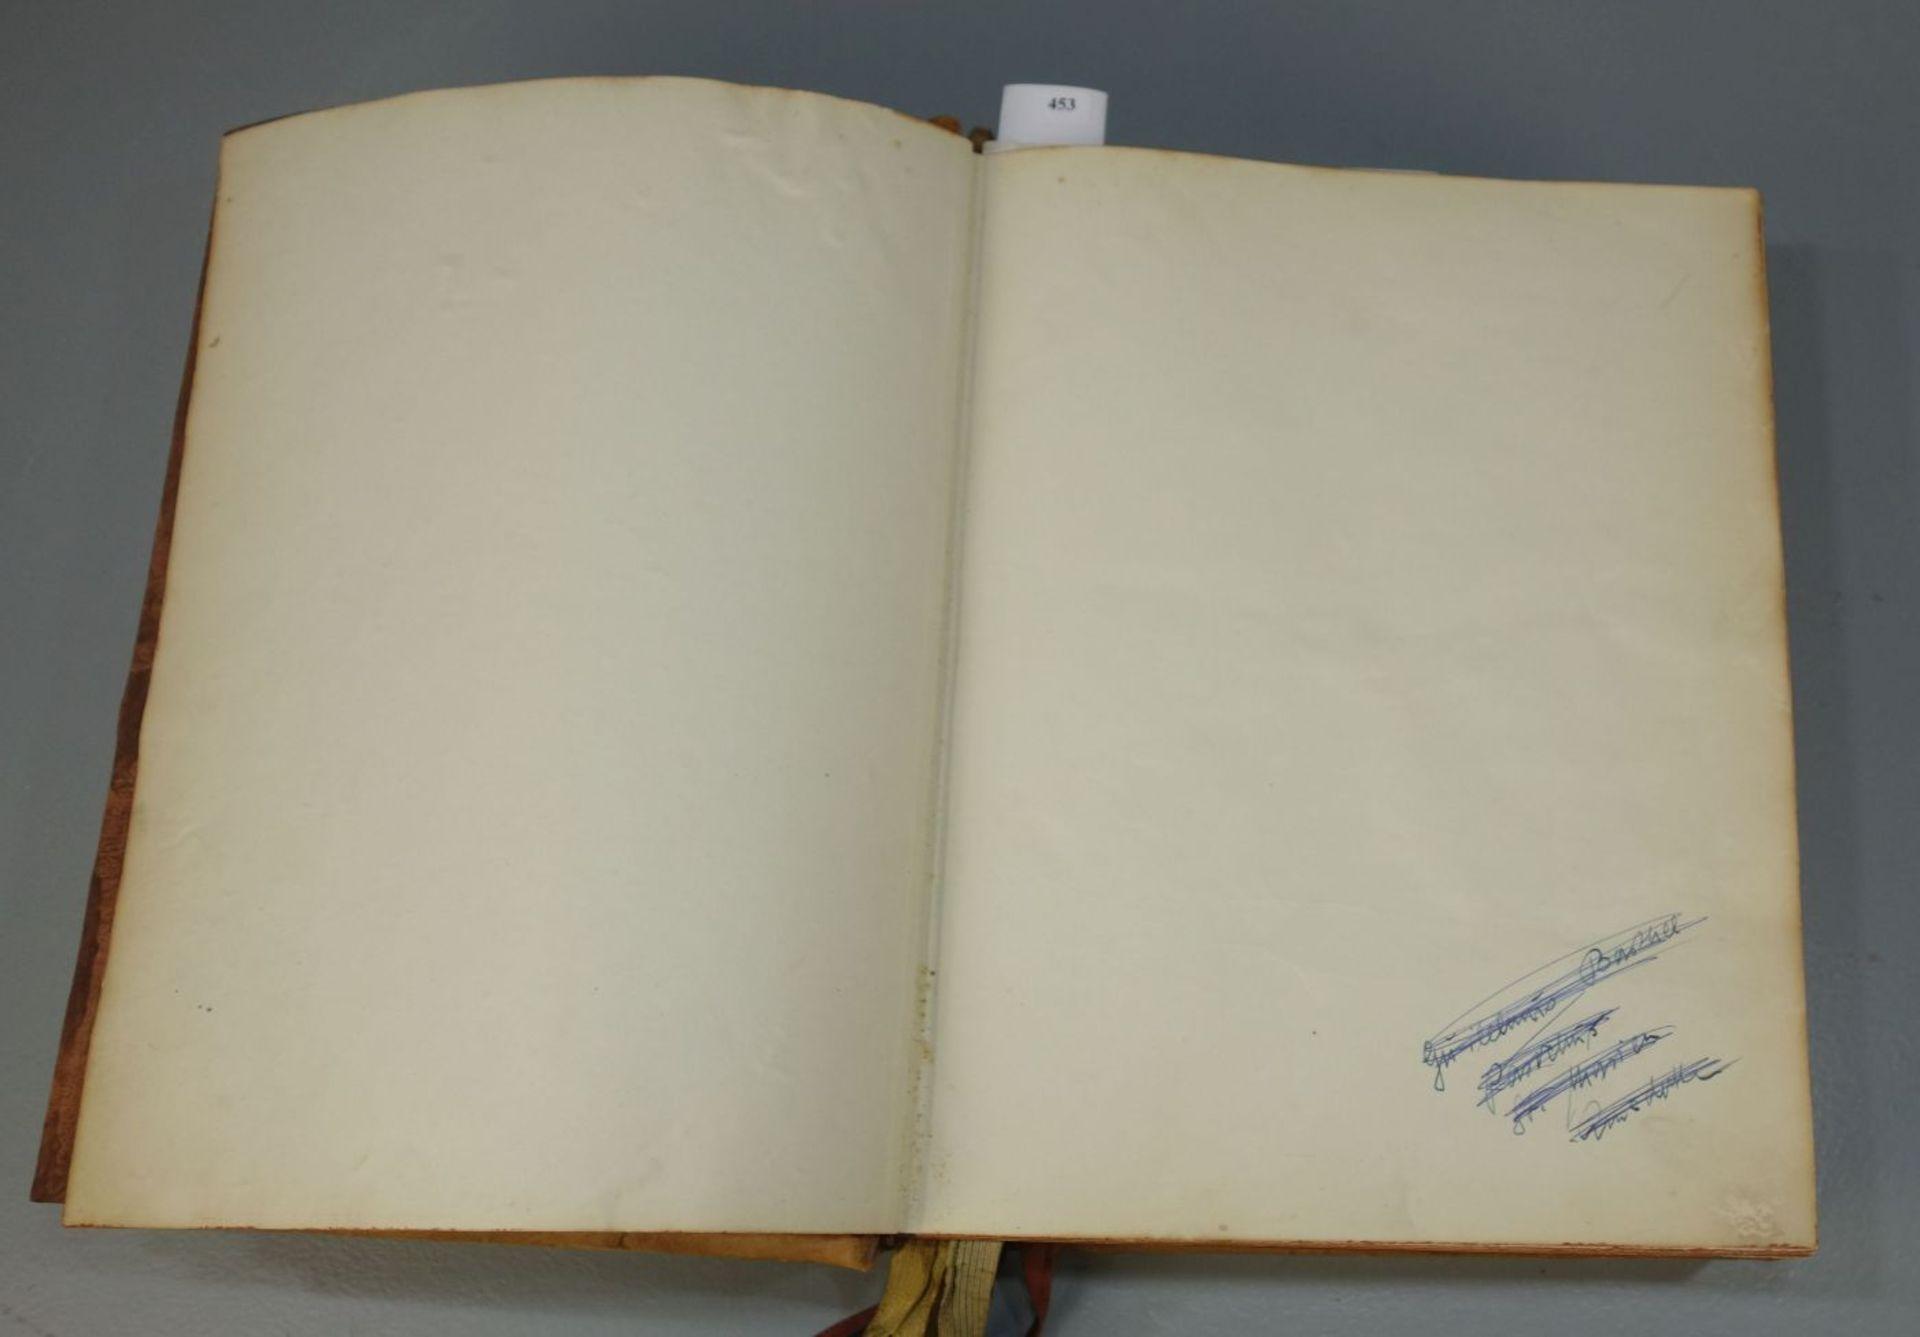 BIBEL IM LEDEREINBAND - Image 4 of 8